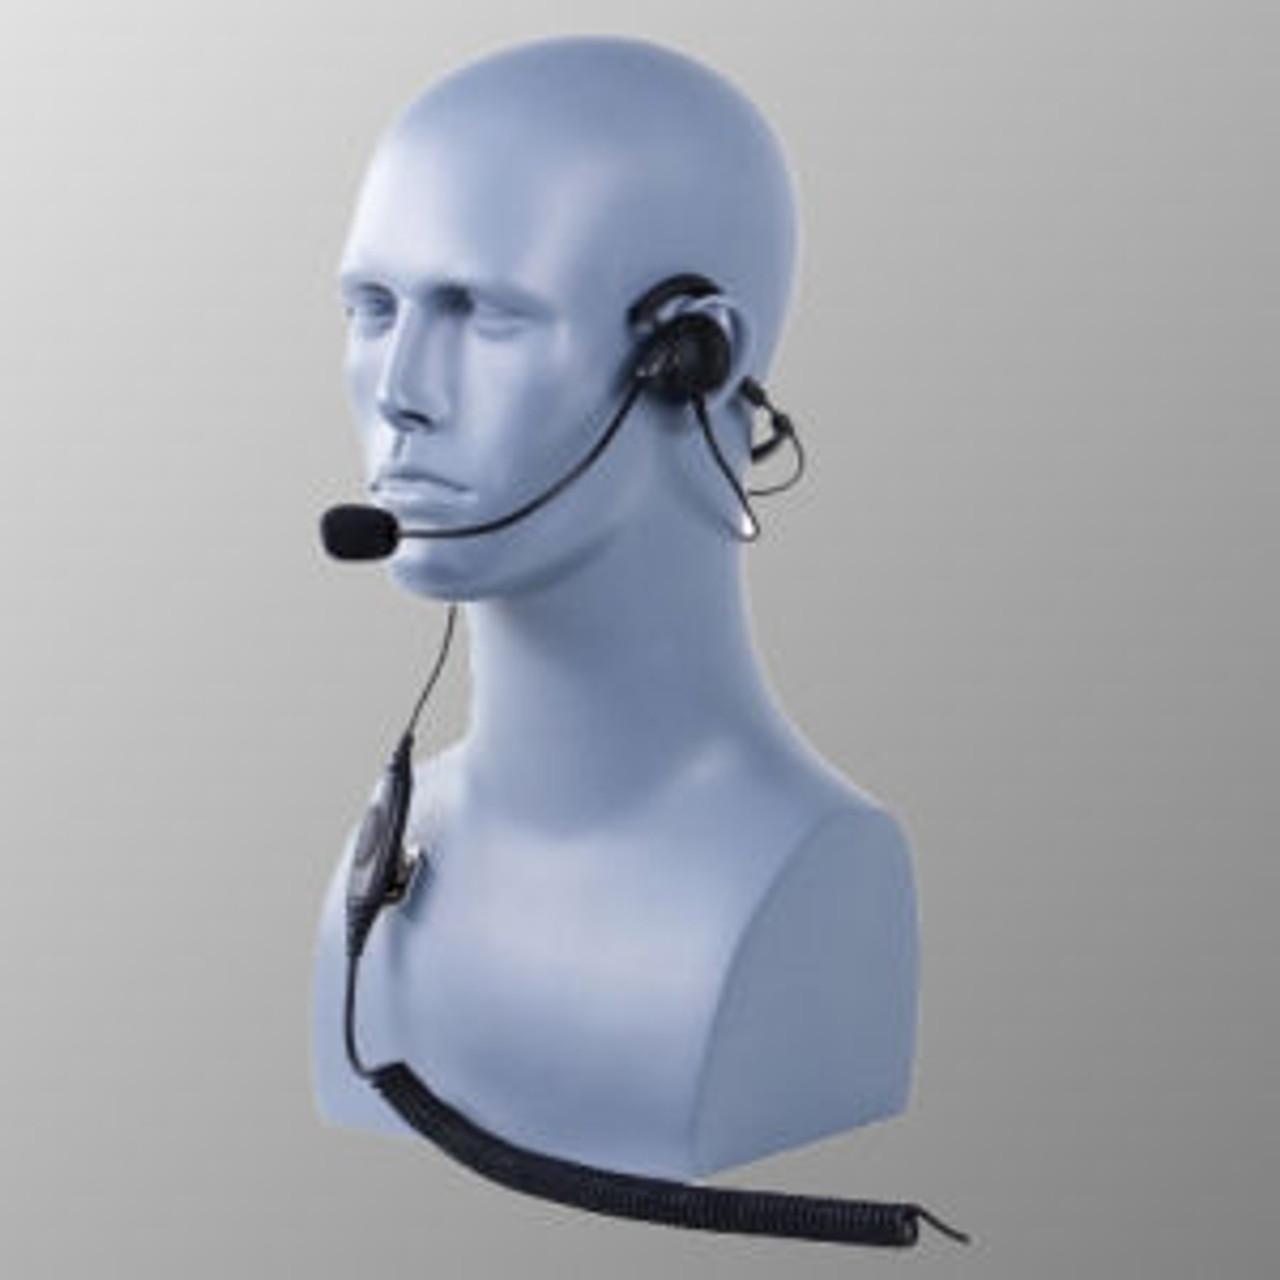 Maxon SP130 Behind The Head Single Muff Lightweight Headset